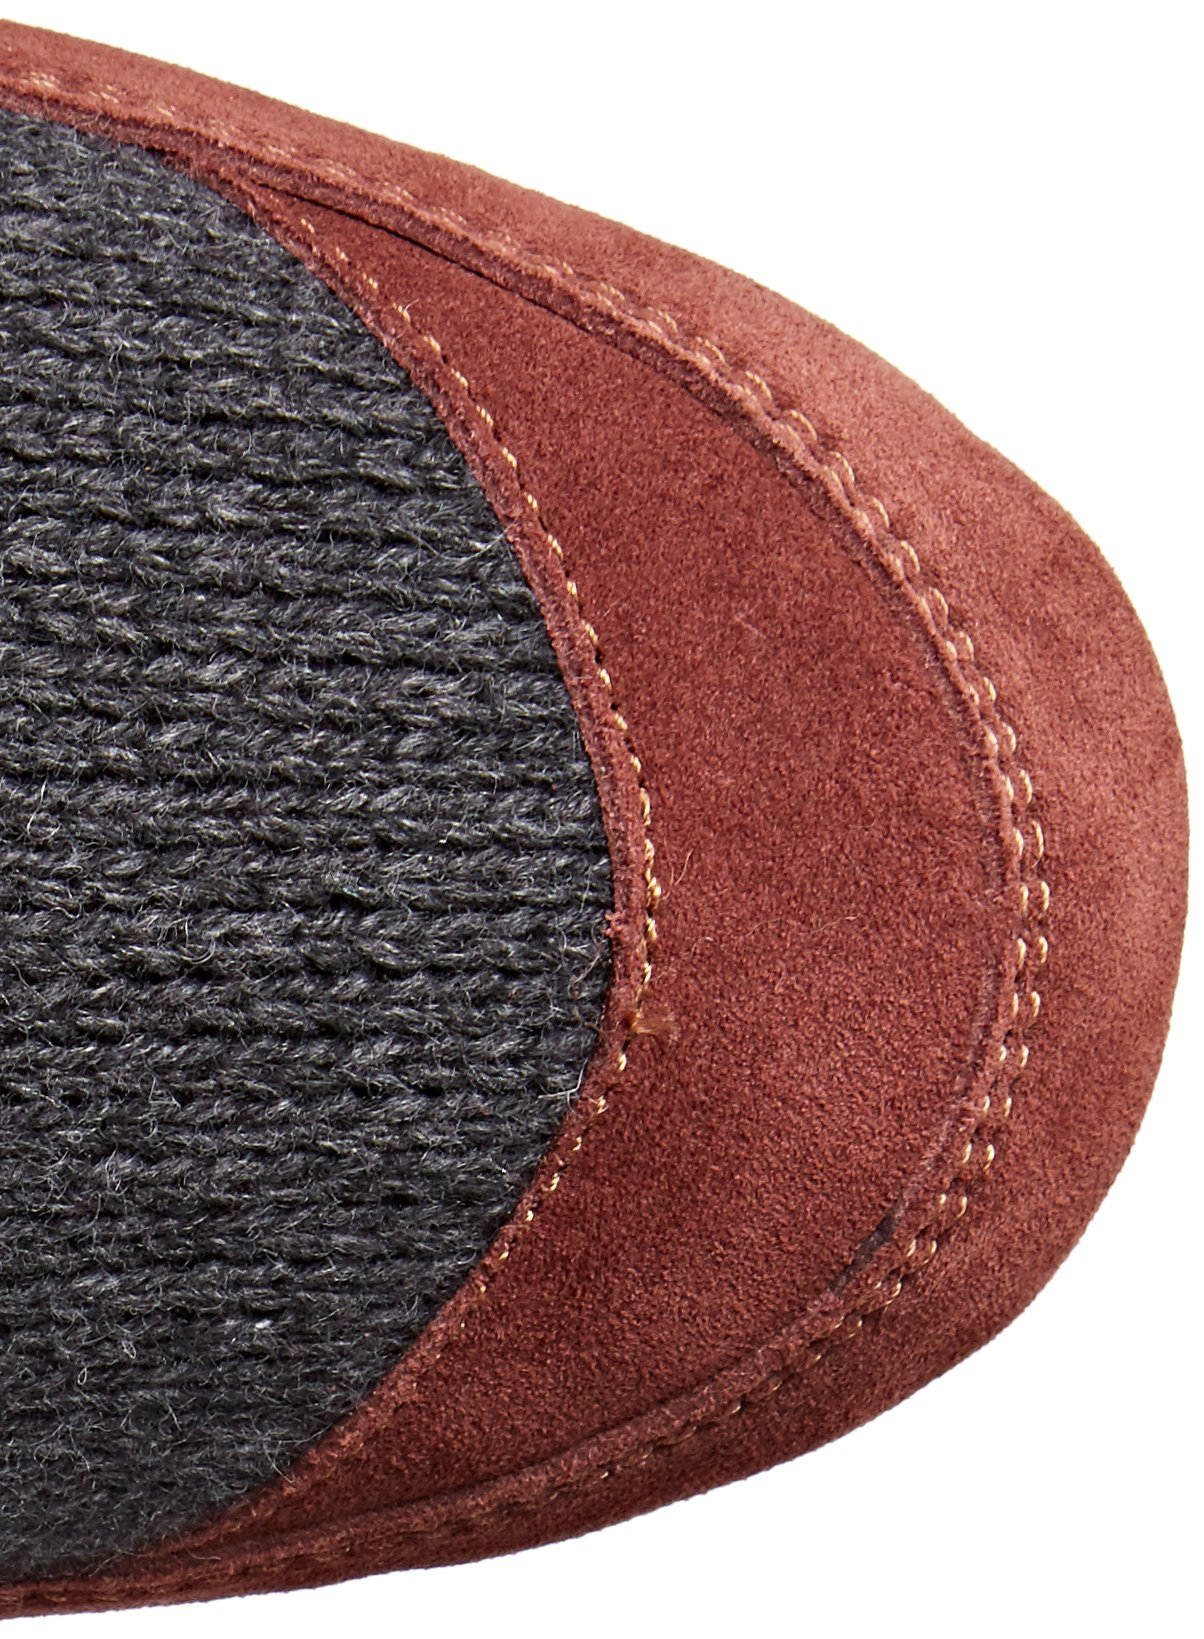 Acorn Men's Slouch Boot Slipper, Charcoal Ragg Wool, Medium/9-10 B US by Acorn (Image #8)